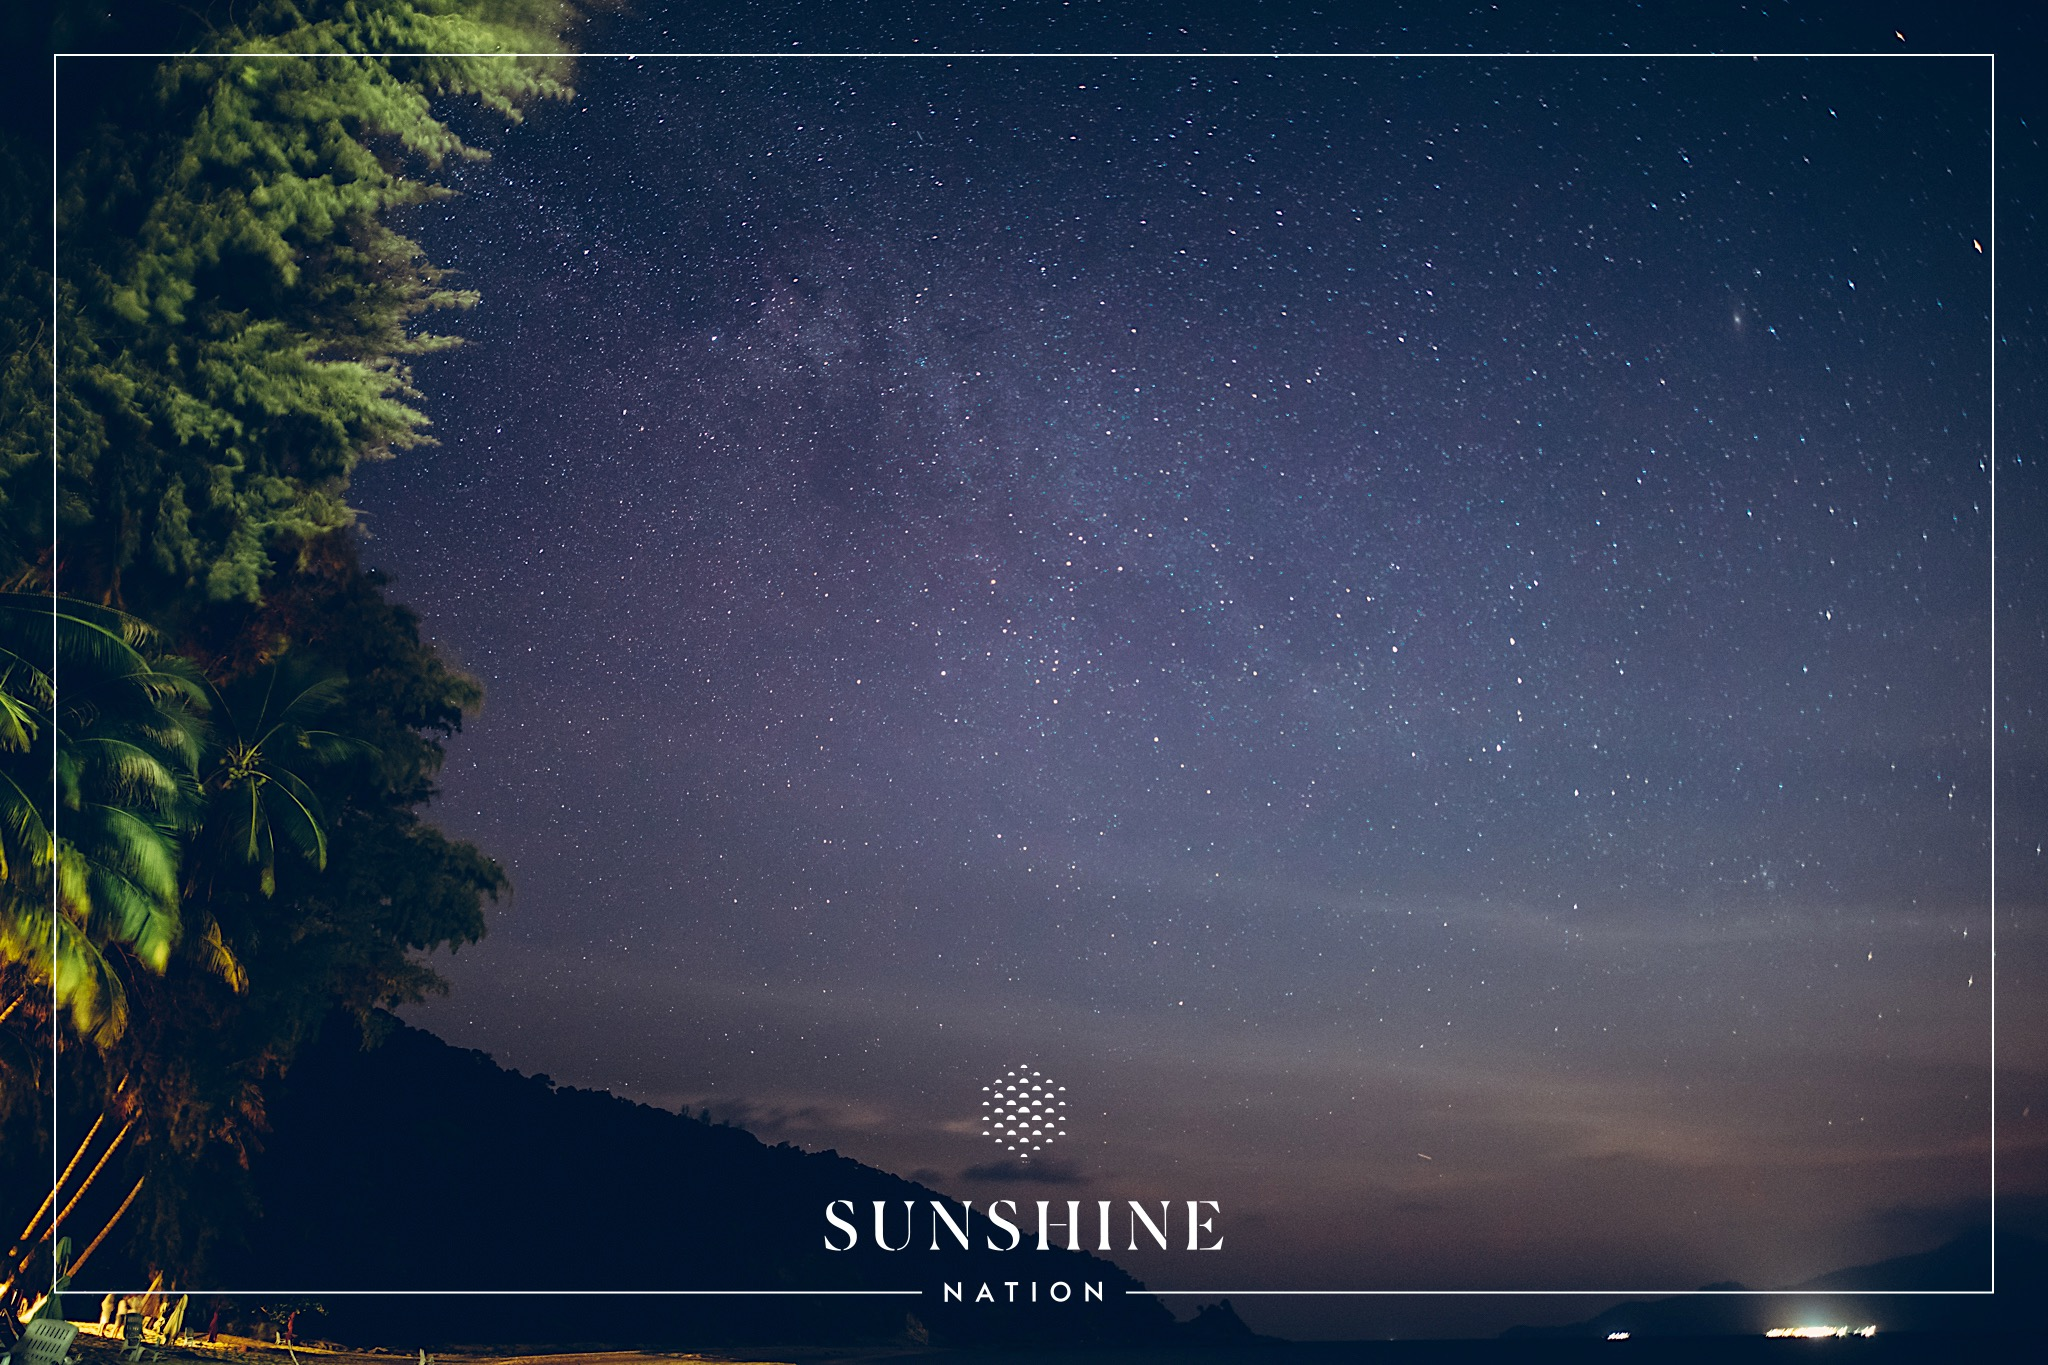 28092018_SunshineNation_Colossal346_Watermarked.jpg